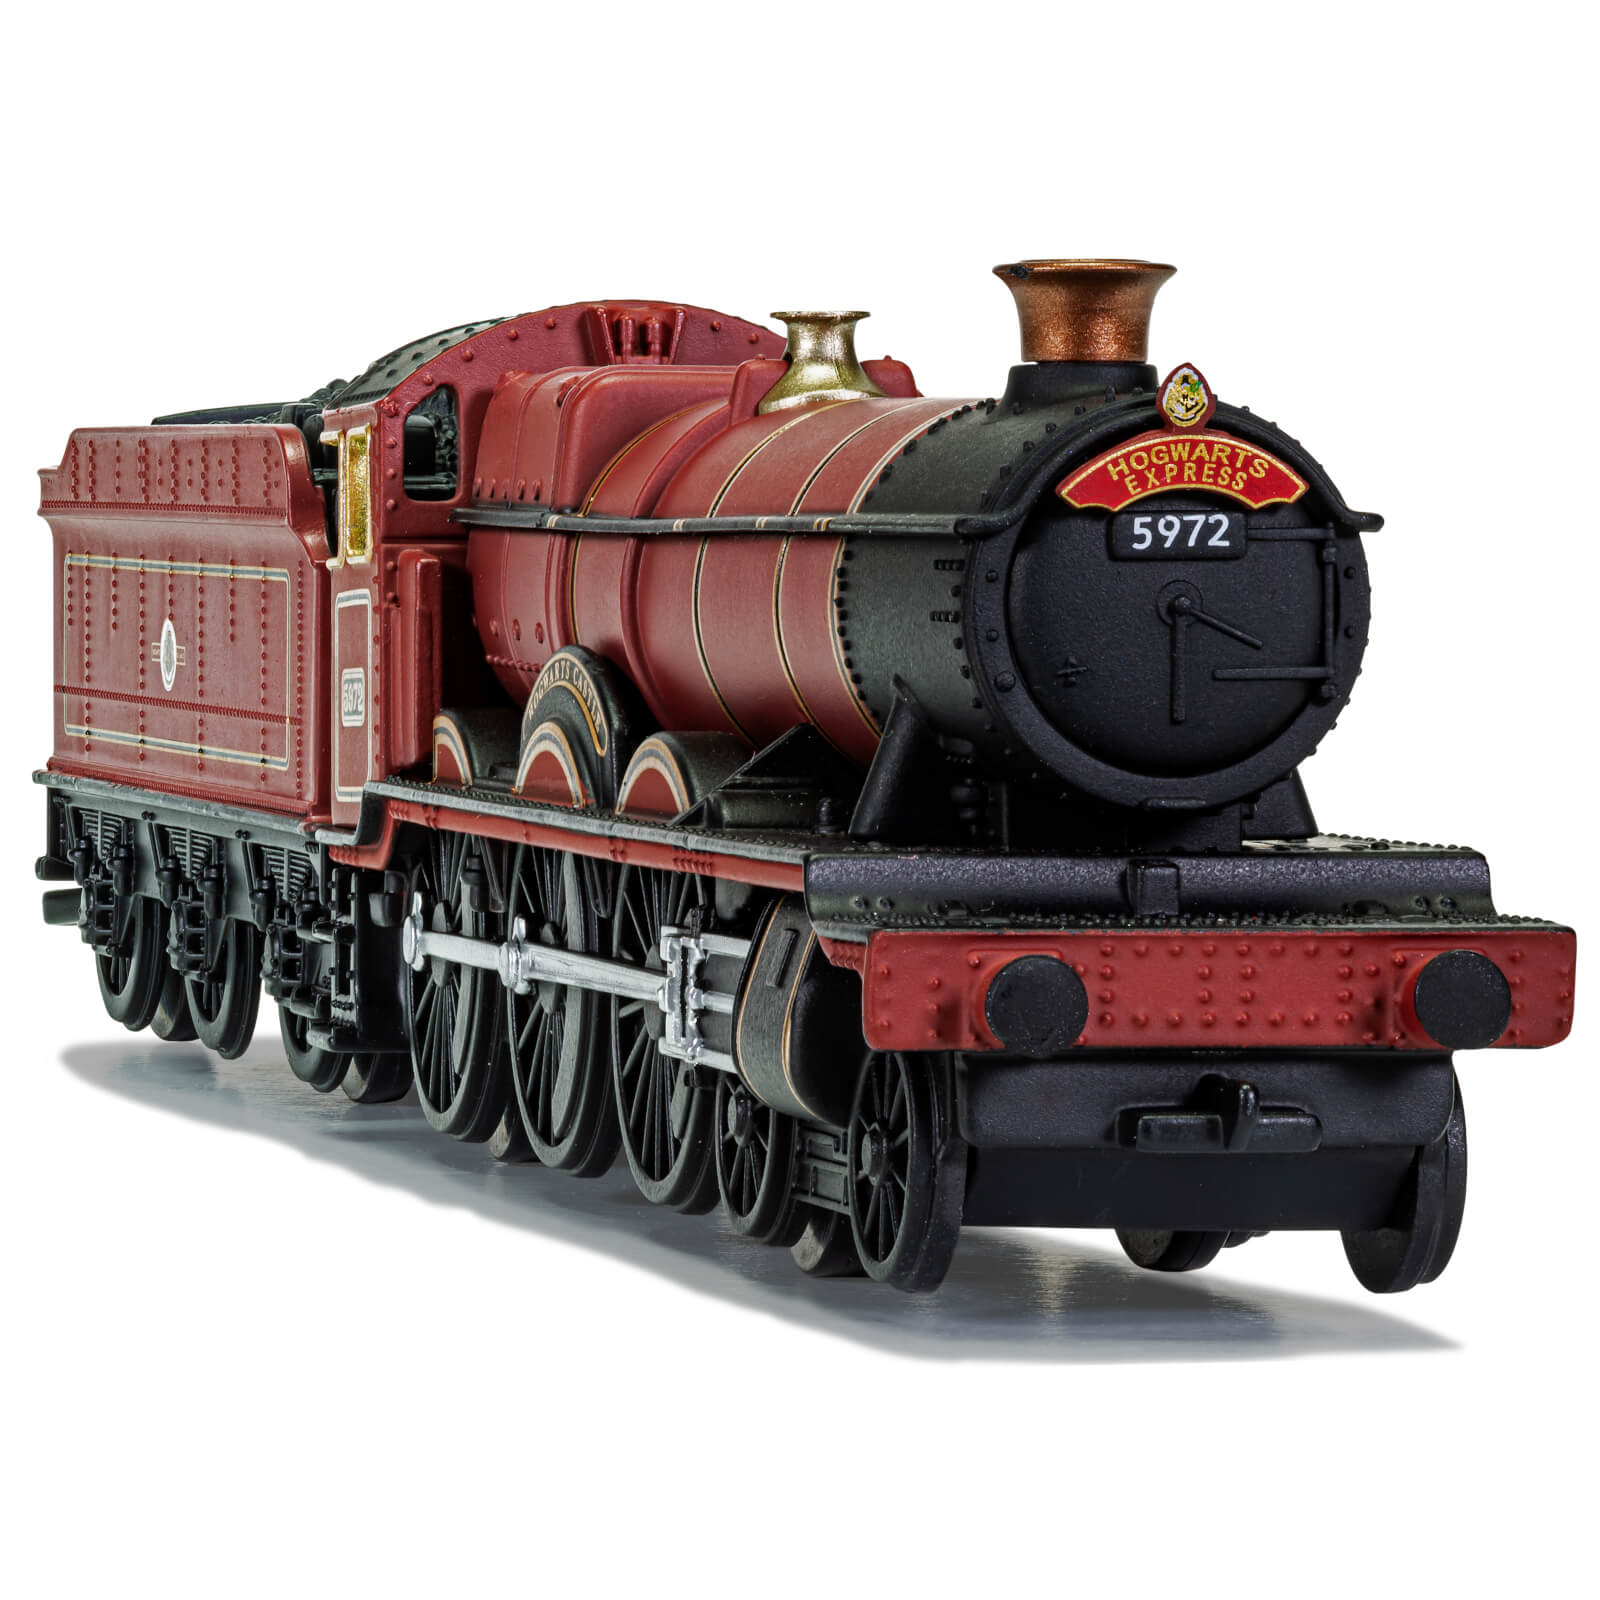 Image of Harry Potter Hogwarts Express Model Set - Scale 1:100